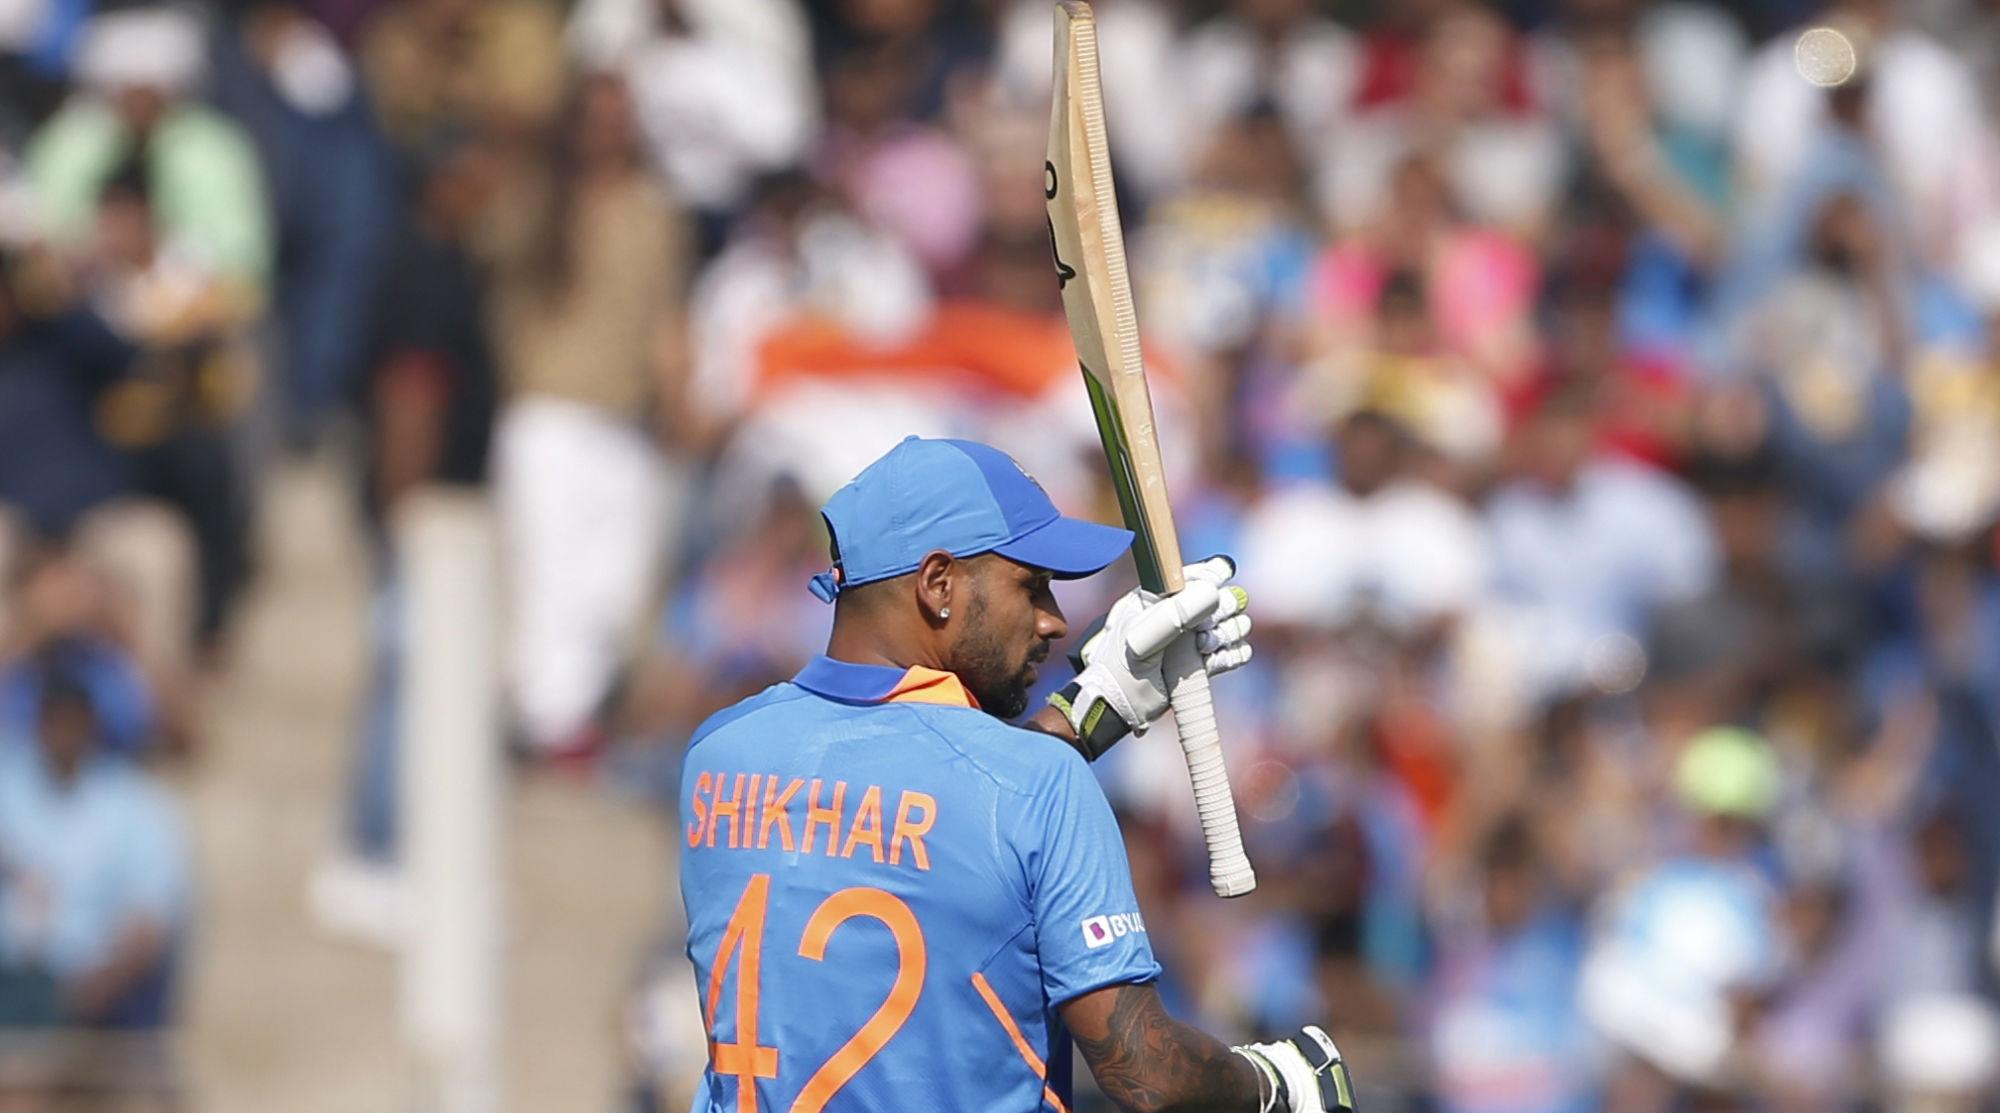 IND vs AUS 1st ODI 2020: India Fold for 255 Despite Shikhar Dhawan's 74 at Wankhede Stadium